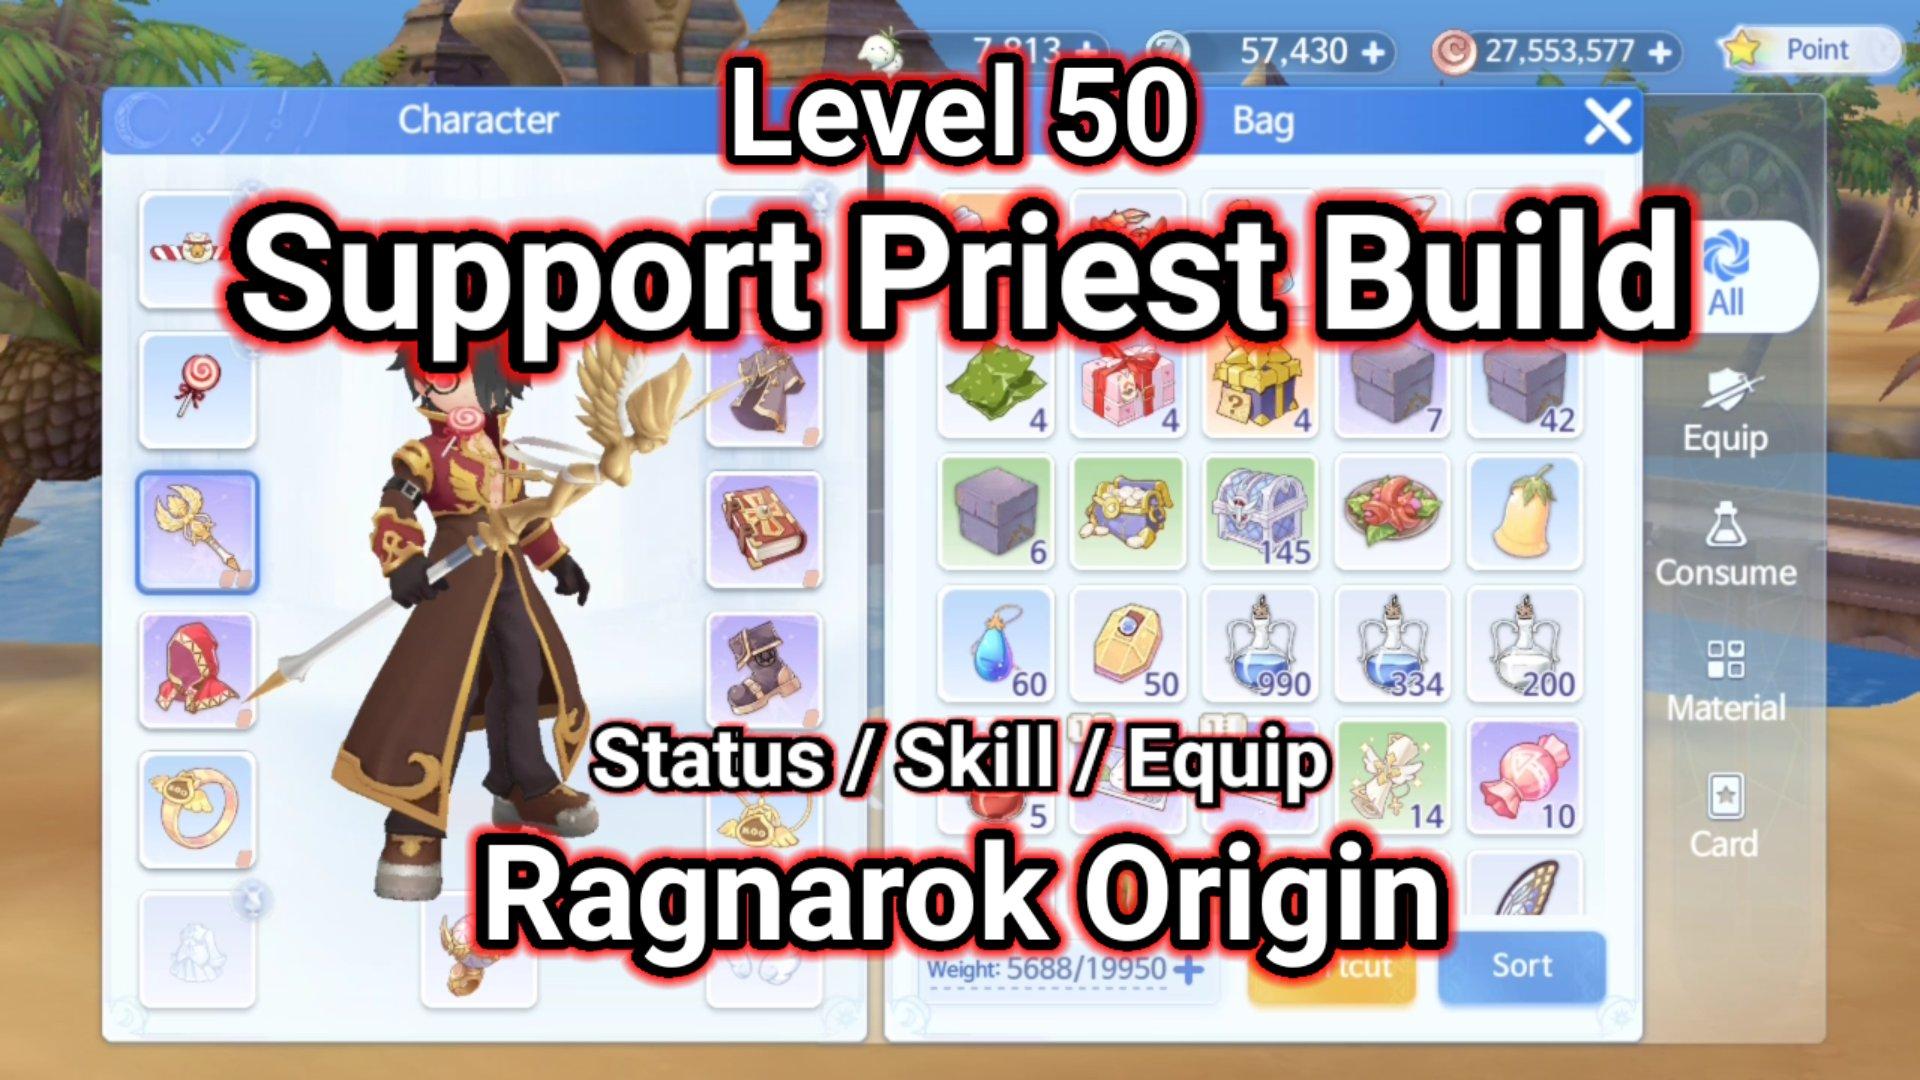 Level 50 Support Priest Build Ragnarok Origin ラグオリ   라그나로크 오리진 1